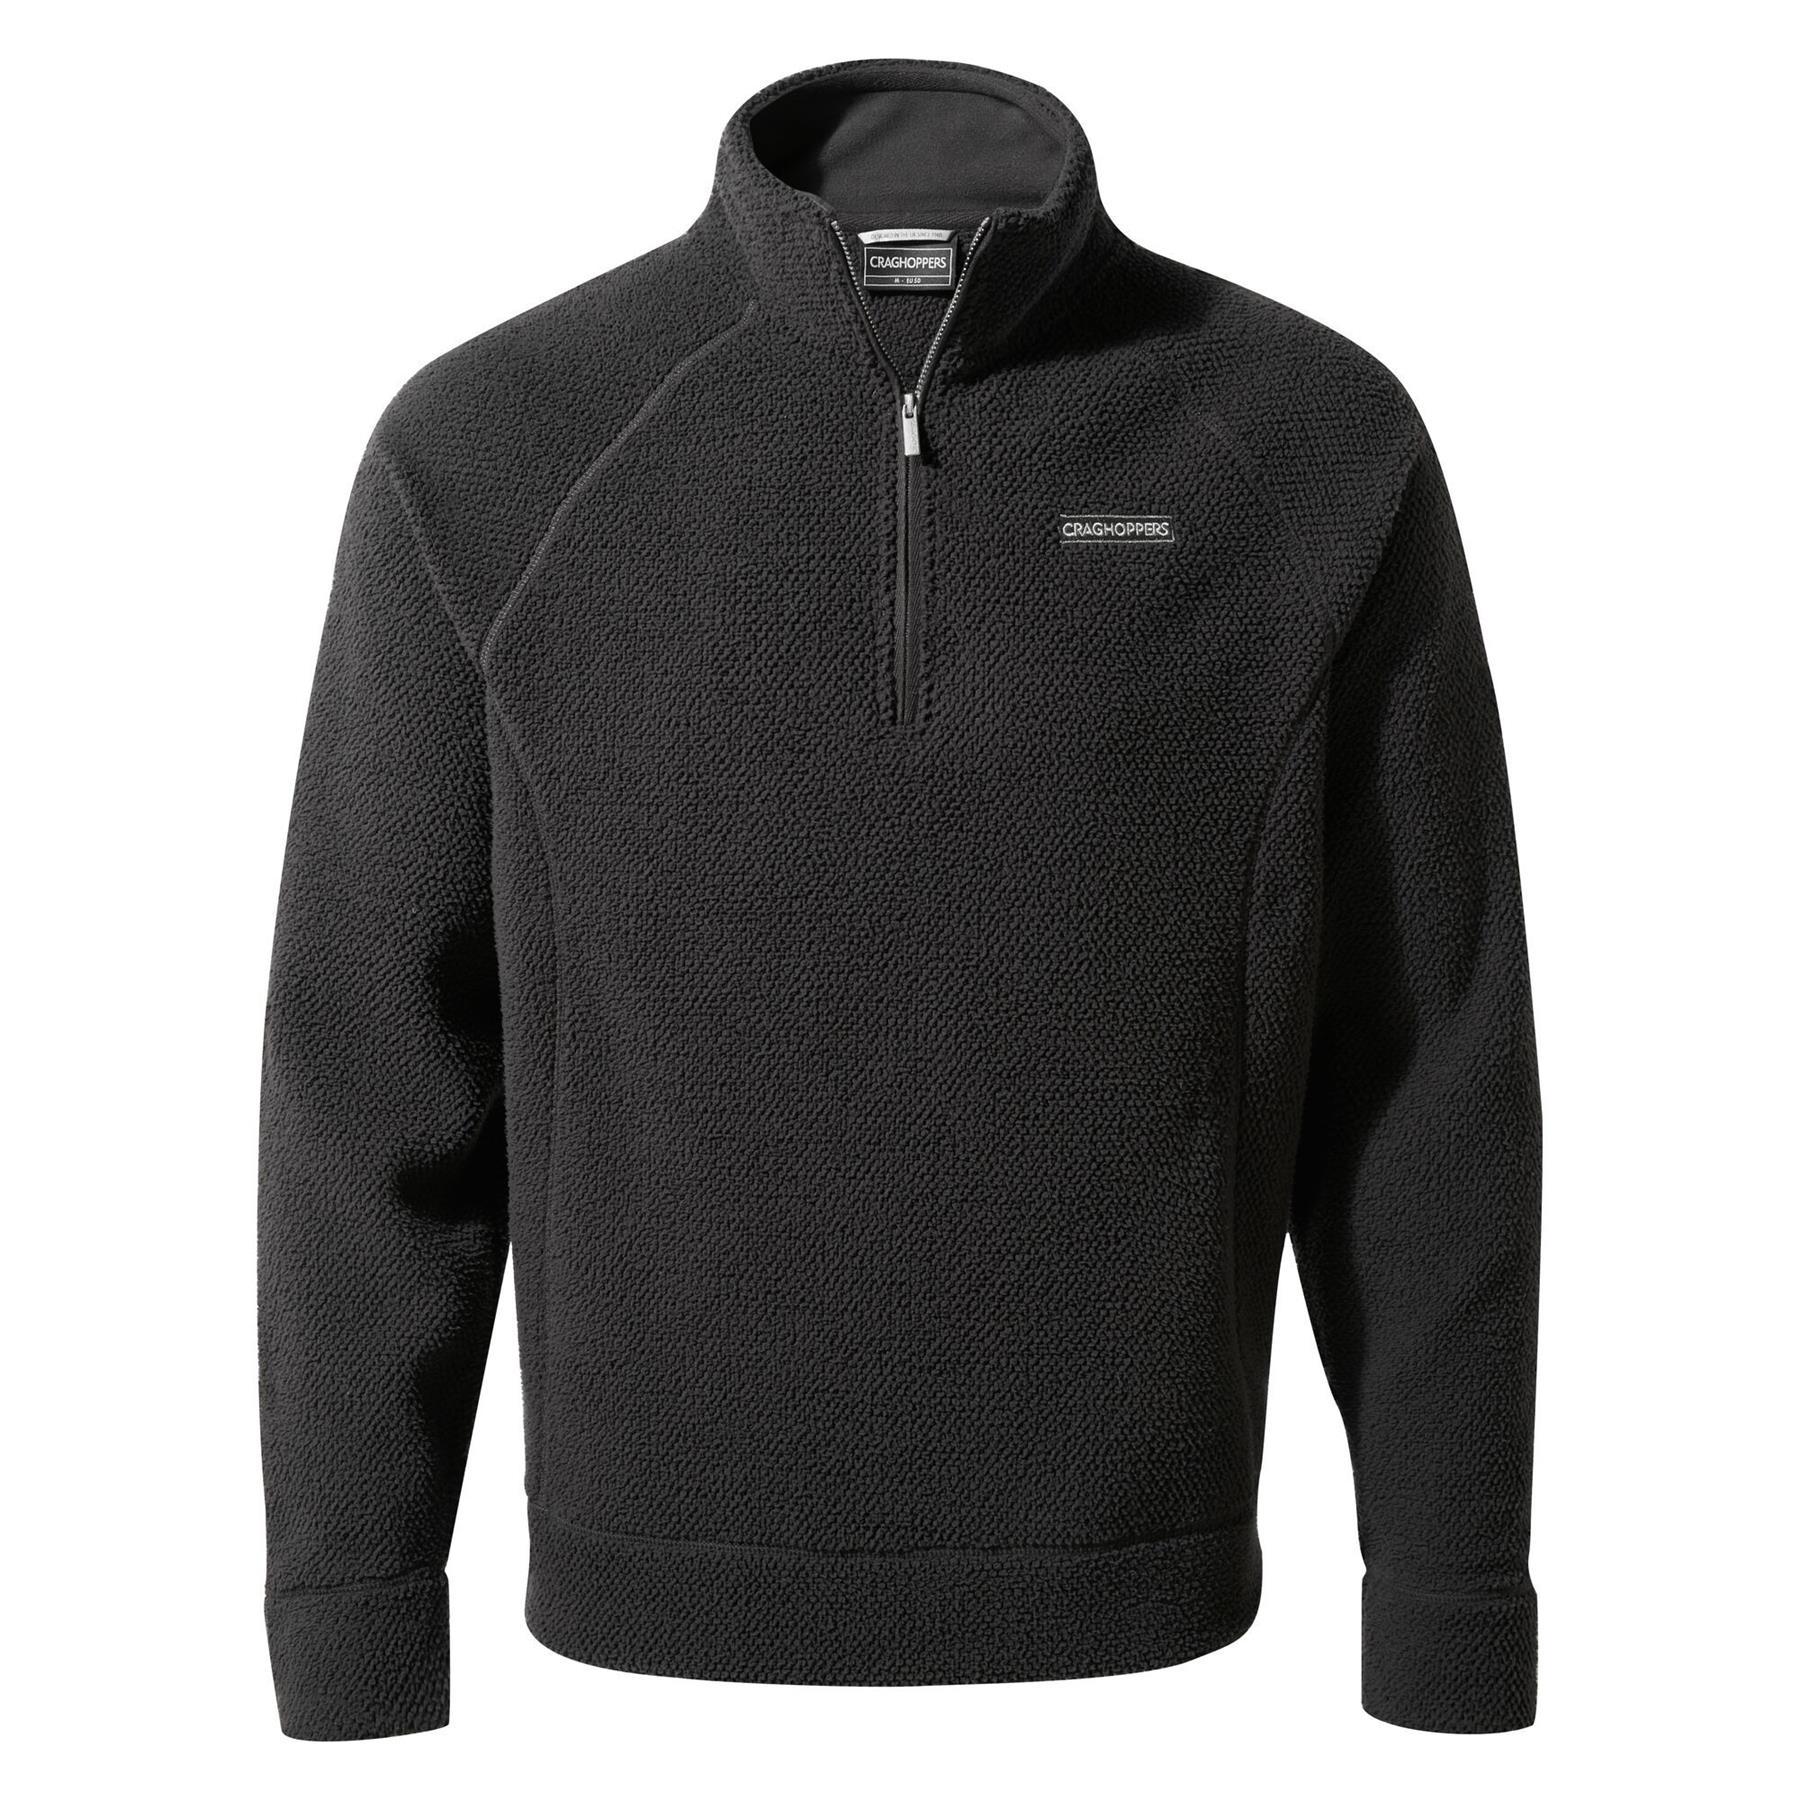 miniatuur 8 - Craghopper Mens Cason Fleece Half Zip Bobble Soft Jumper Pullover Sweater